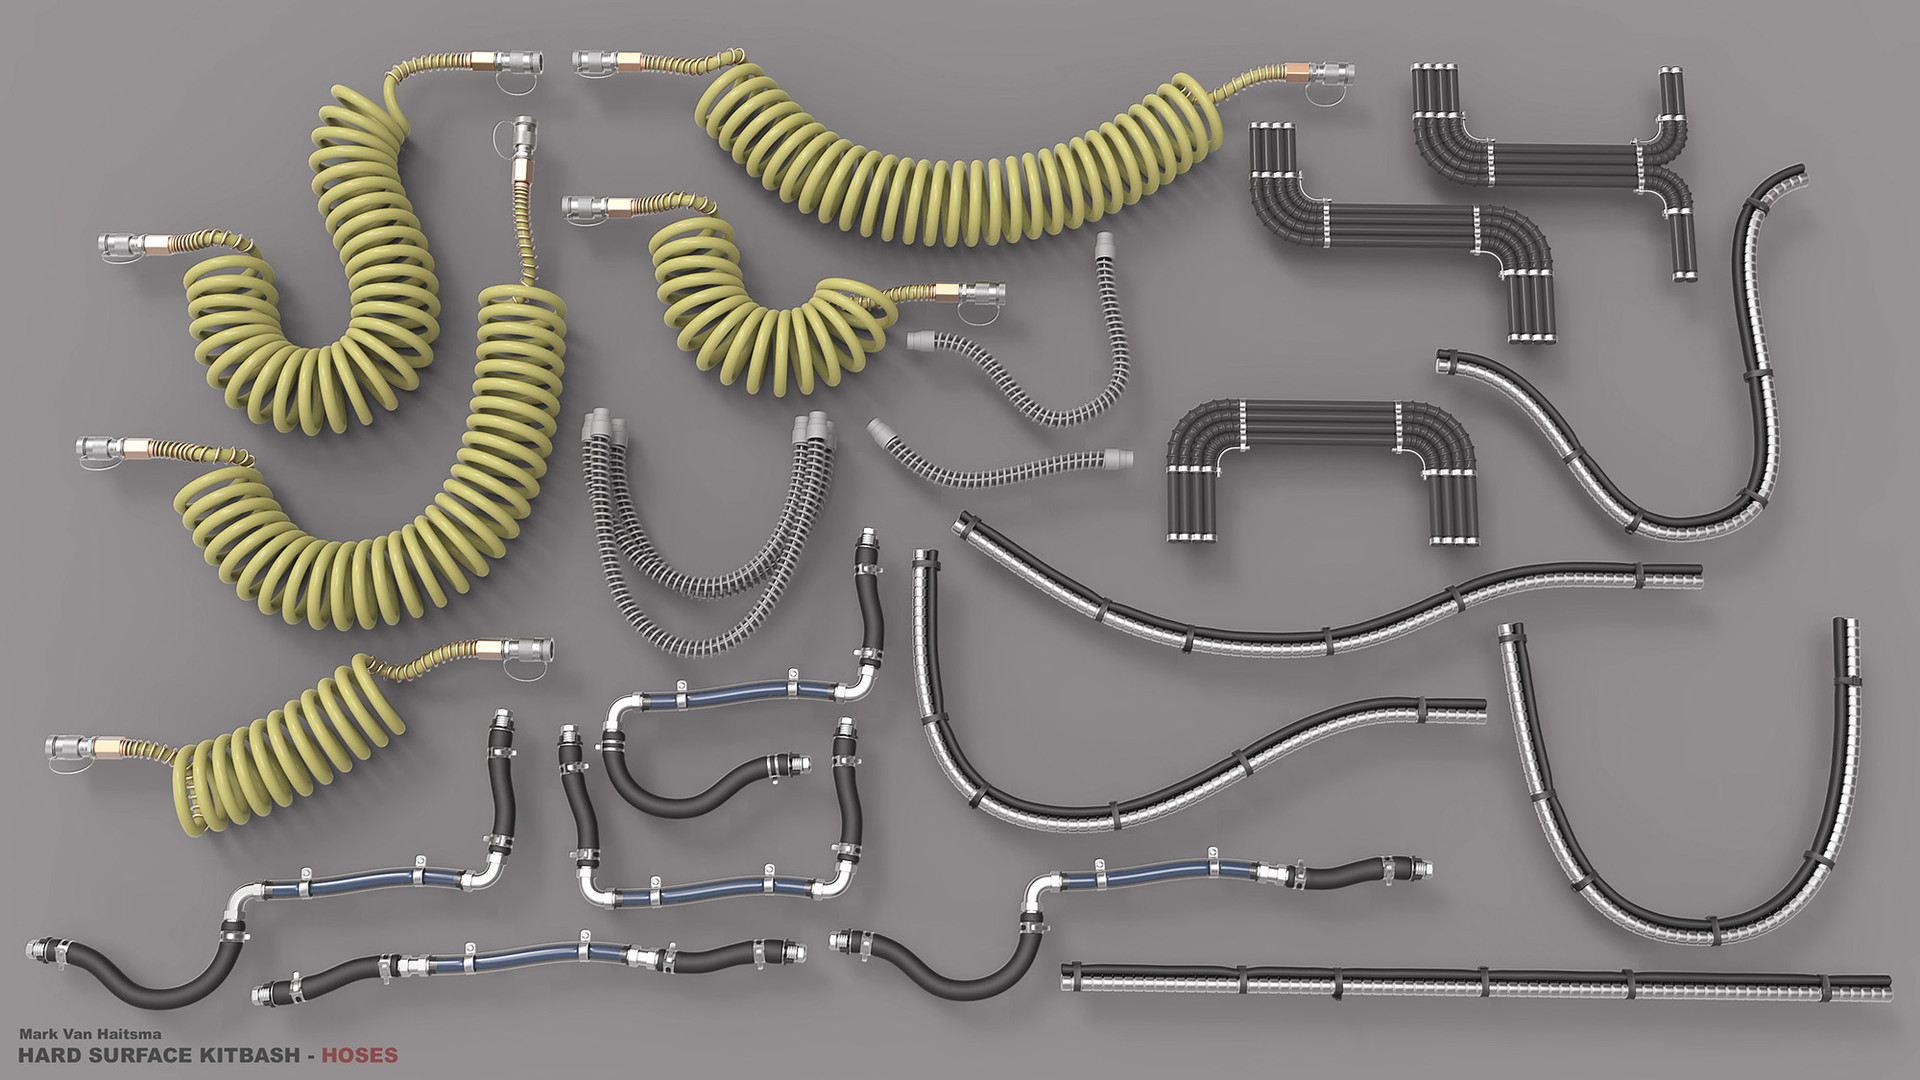 Mark van haitsma hoses collage 04 sm